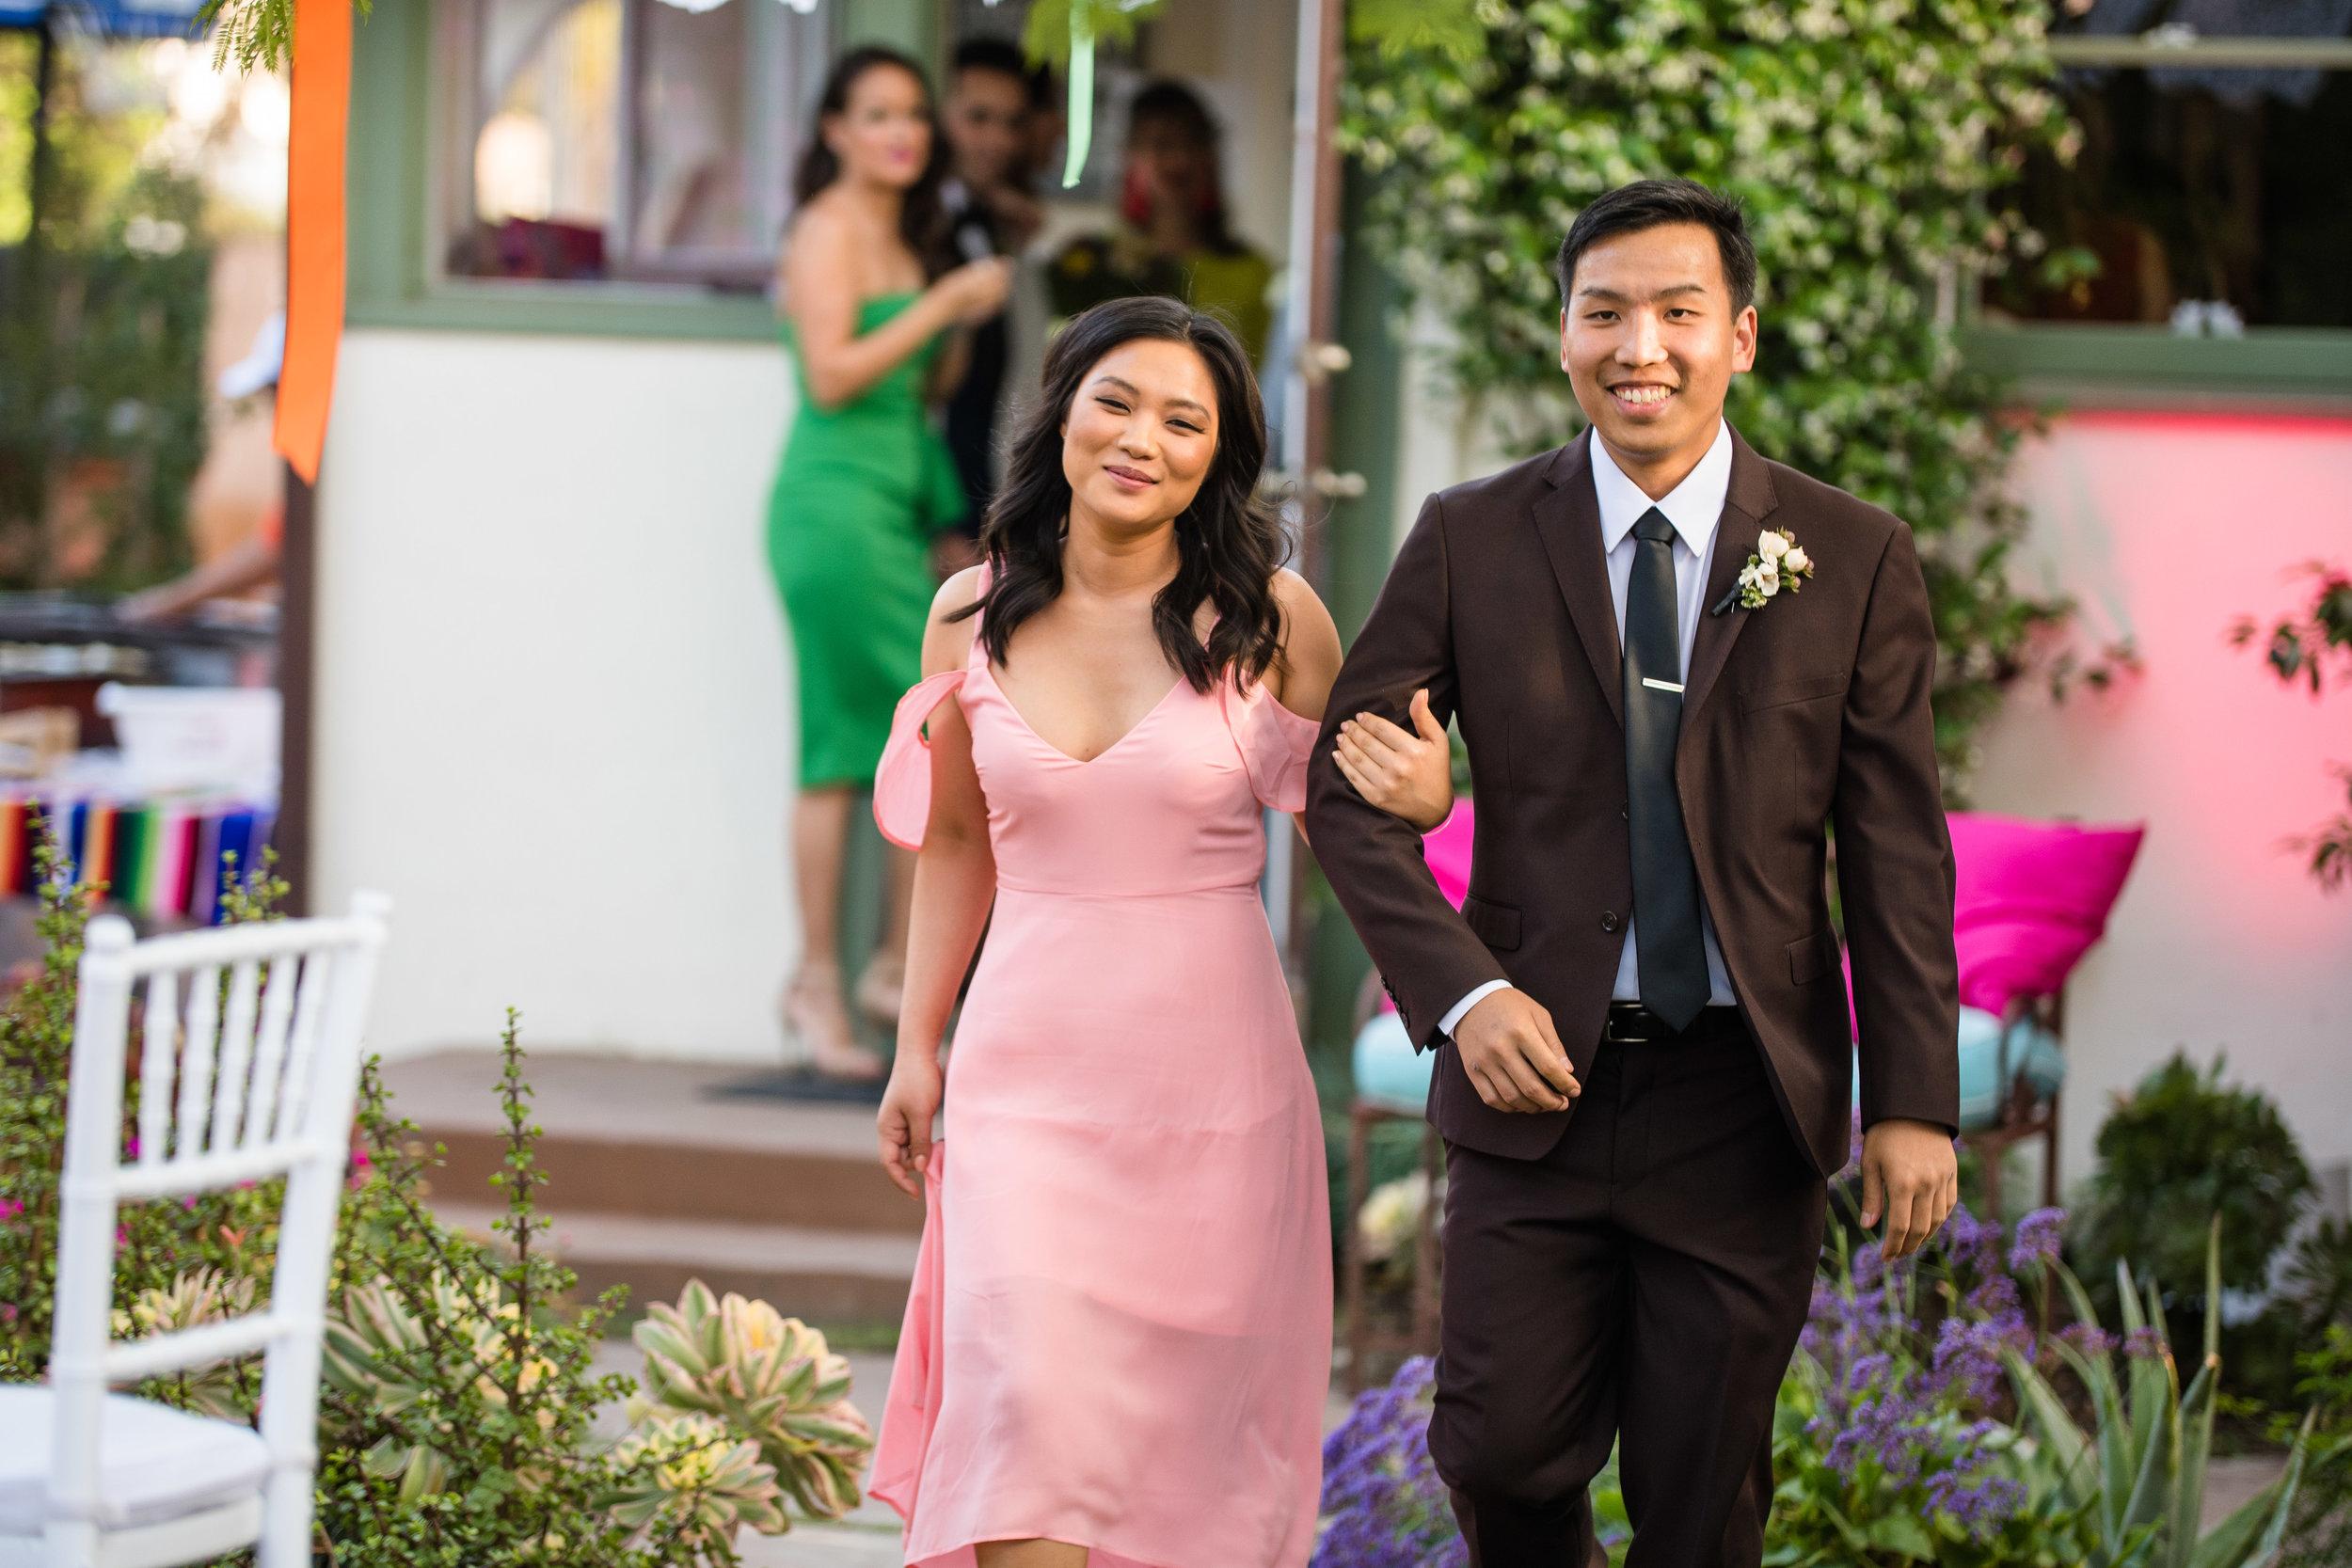 Vibrant Fiesta Backyard Wedding Reception bridesmaid in pink.jpg